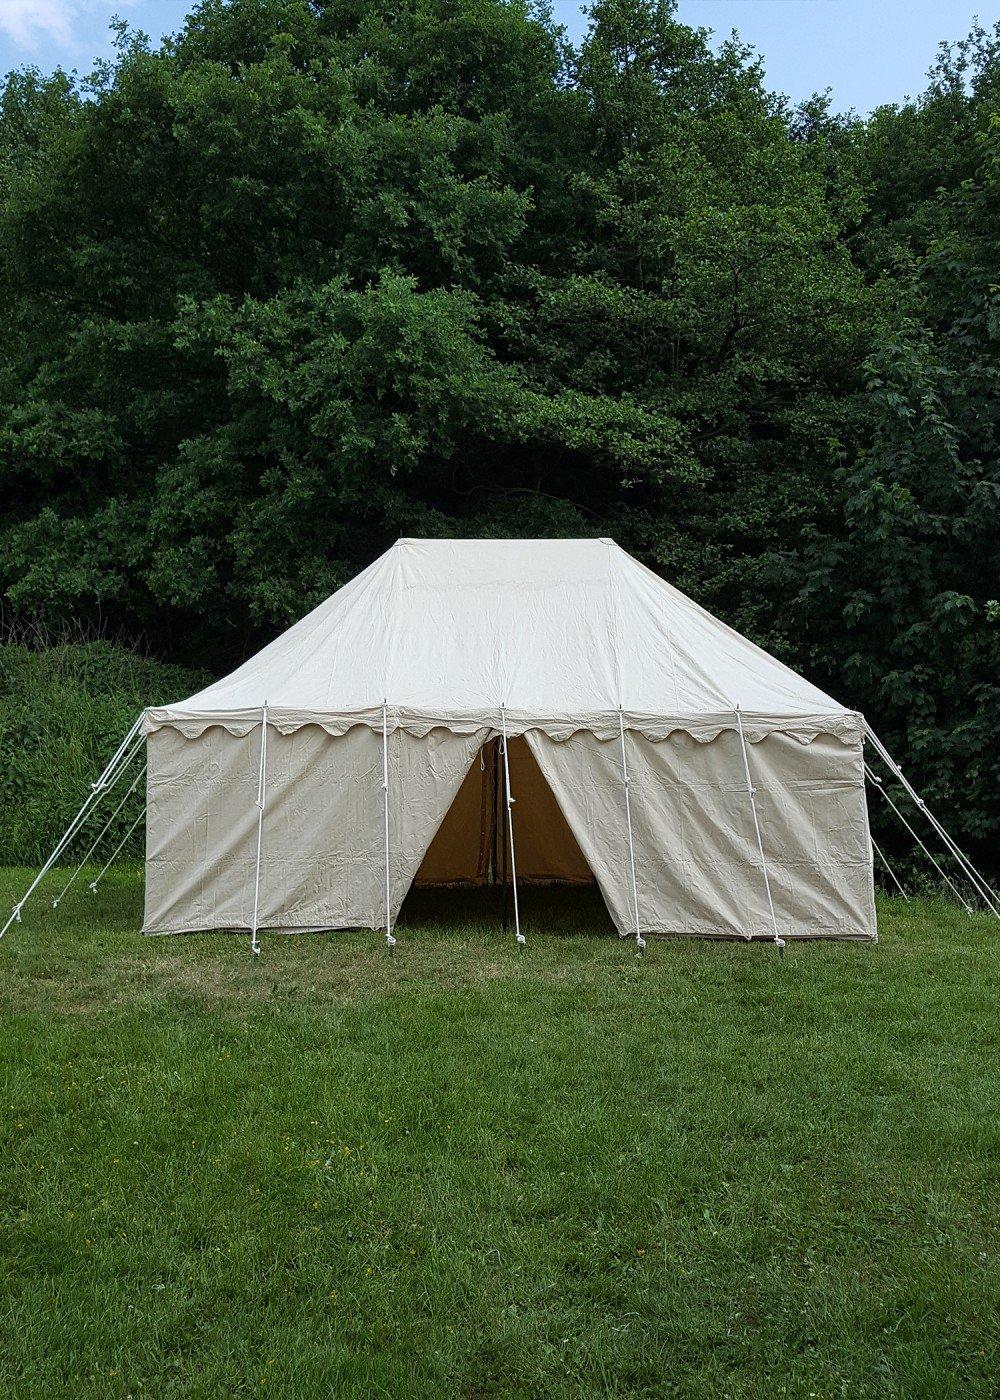 Ritter Tente Mark Ward, 6 x 4 m, 425 GMS, Naturel Camping médiévale Force Tente Roulement LARP Viking  -